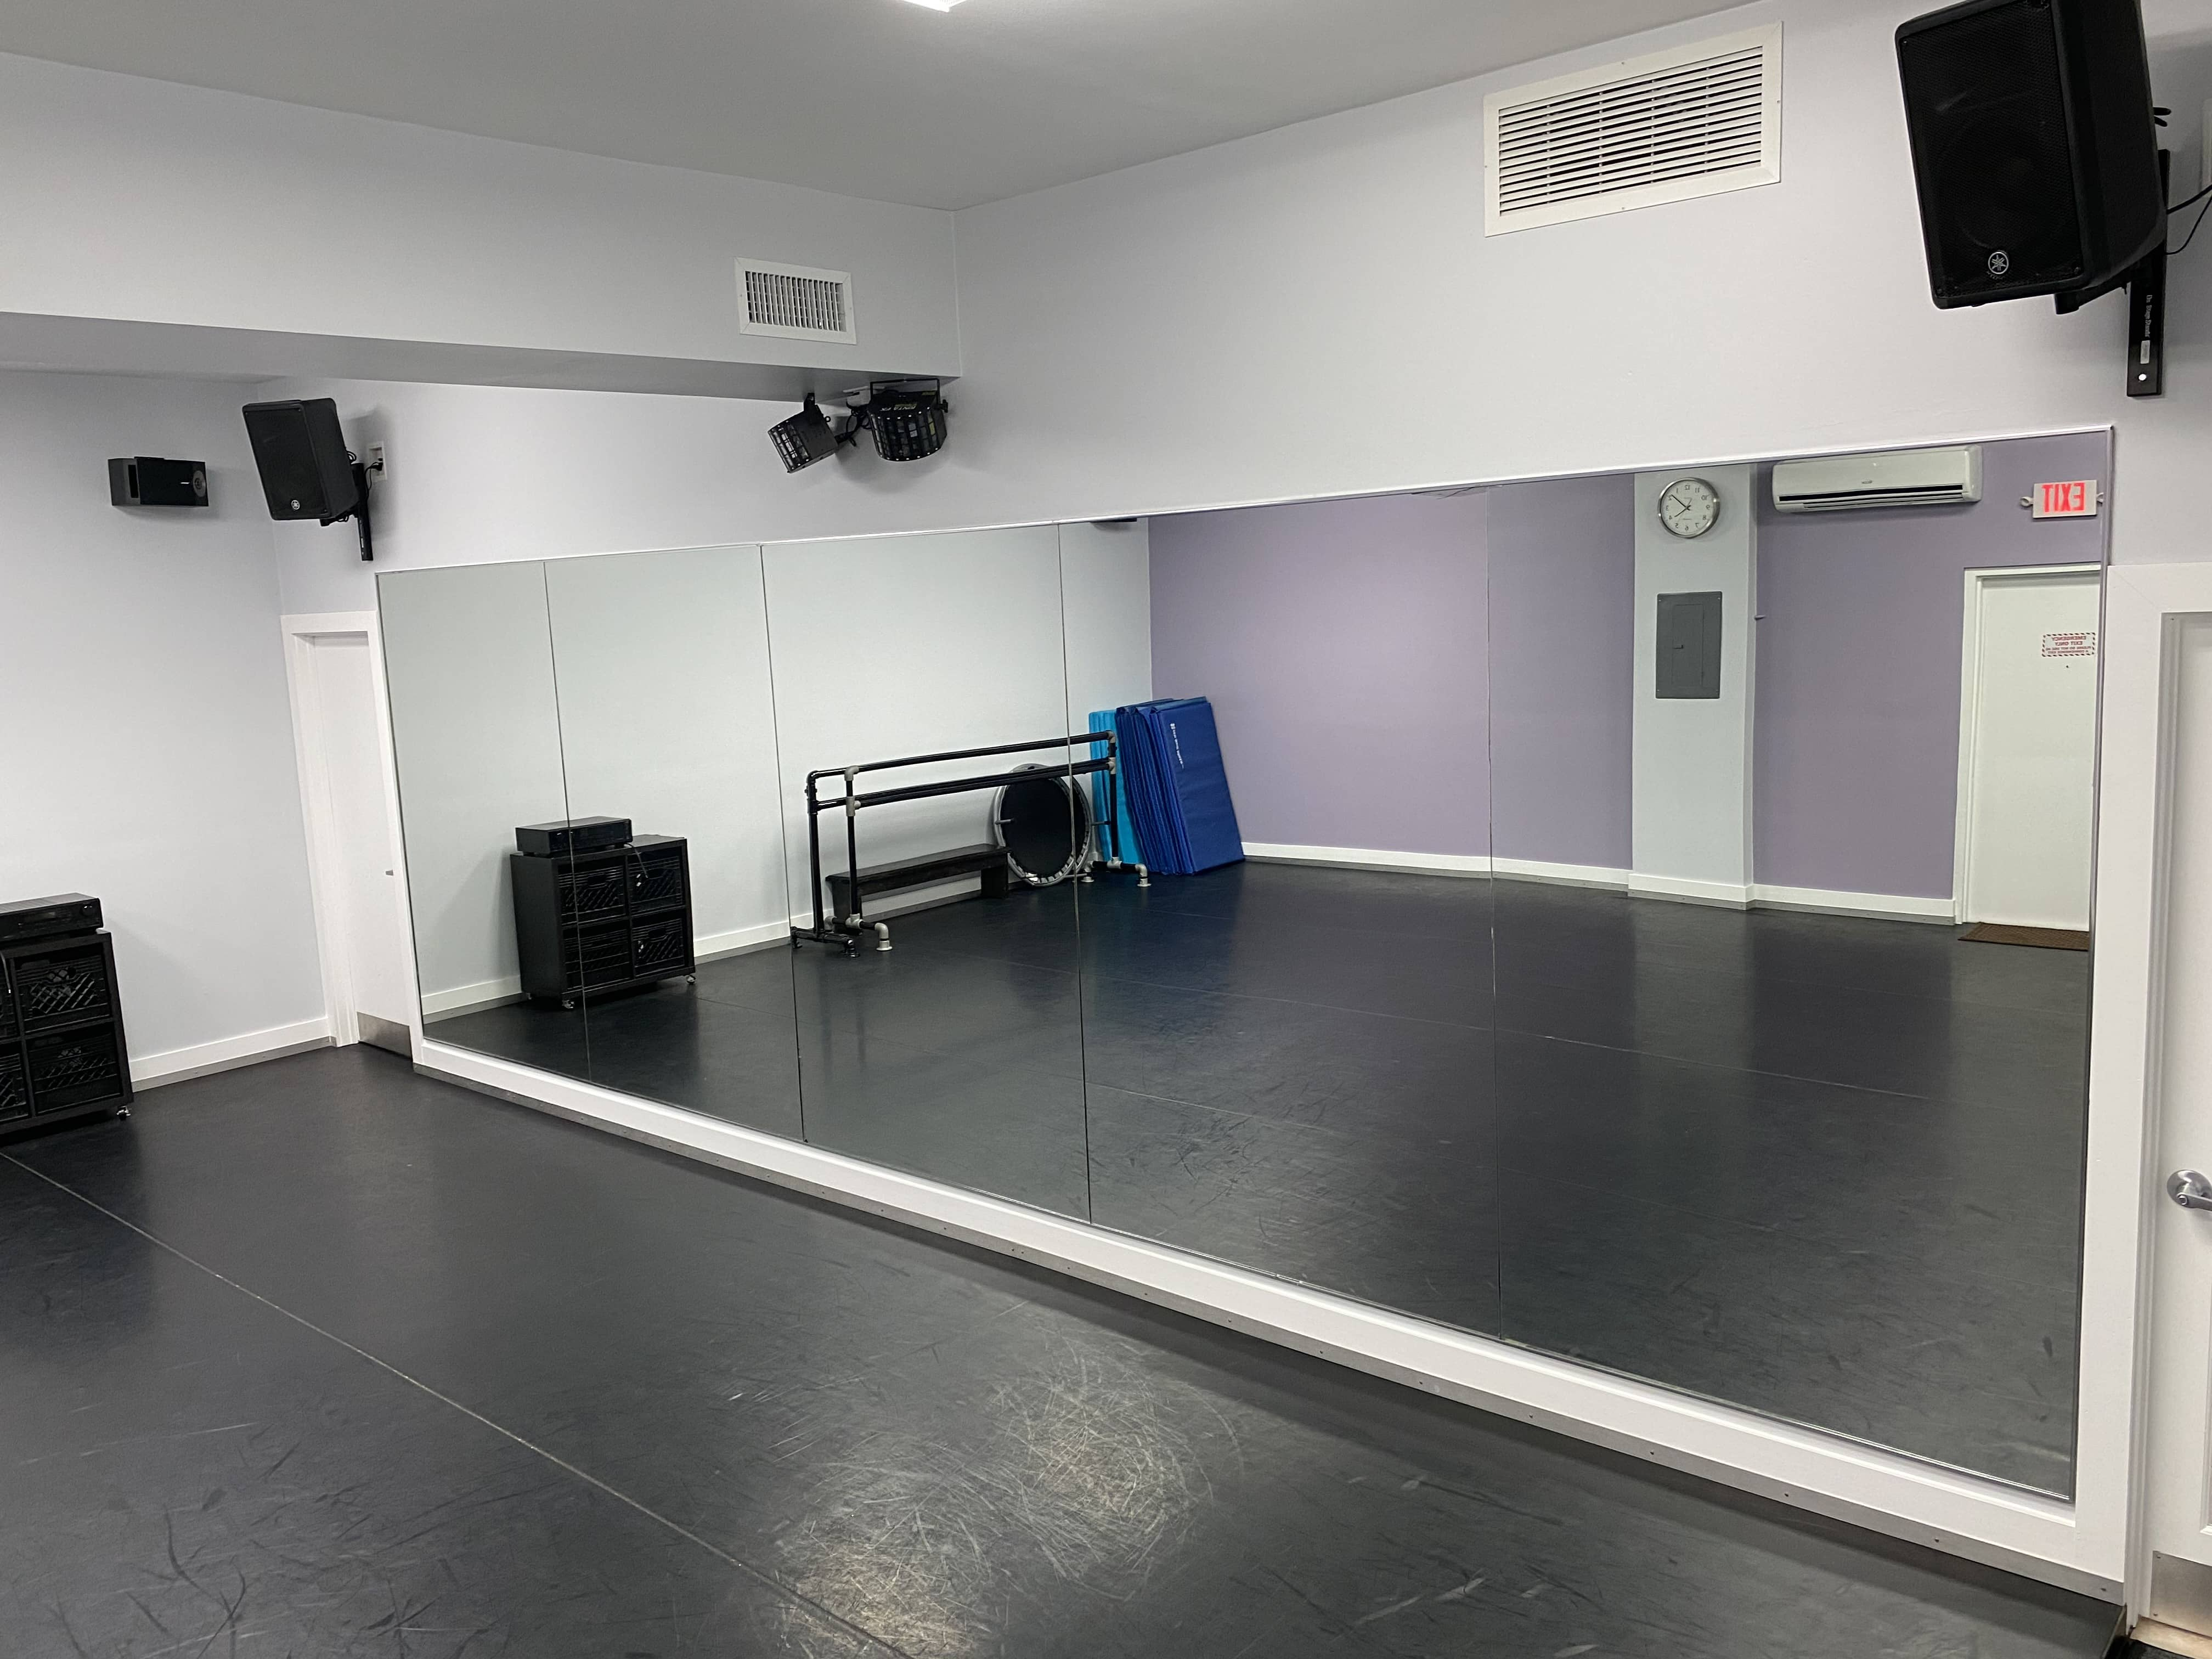 Dance studio with padded floor and mirror facing the dance floor